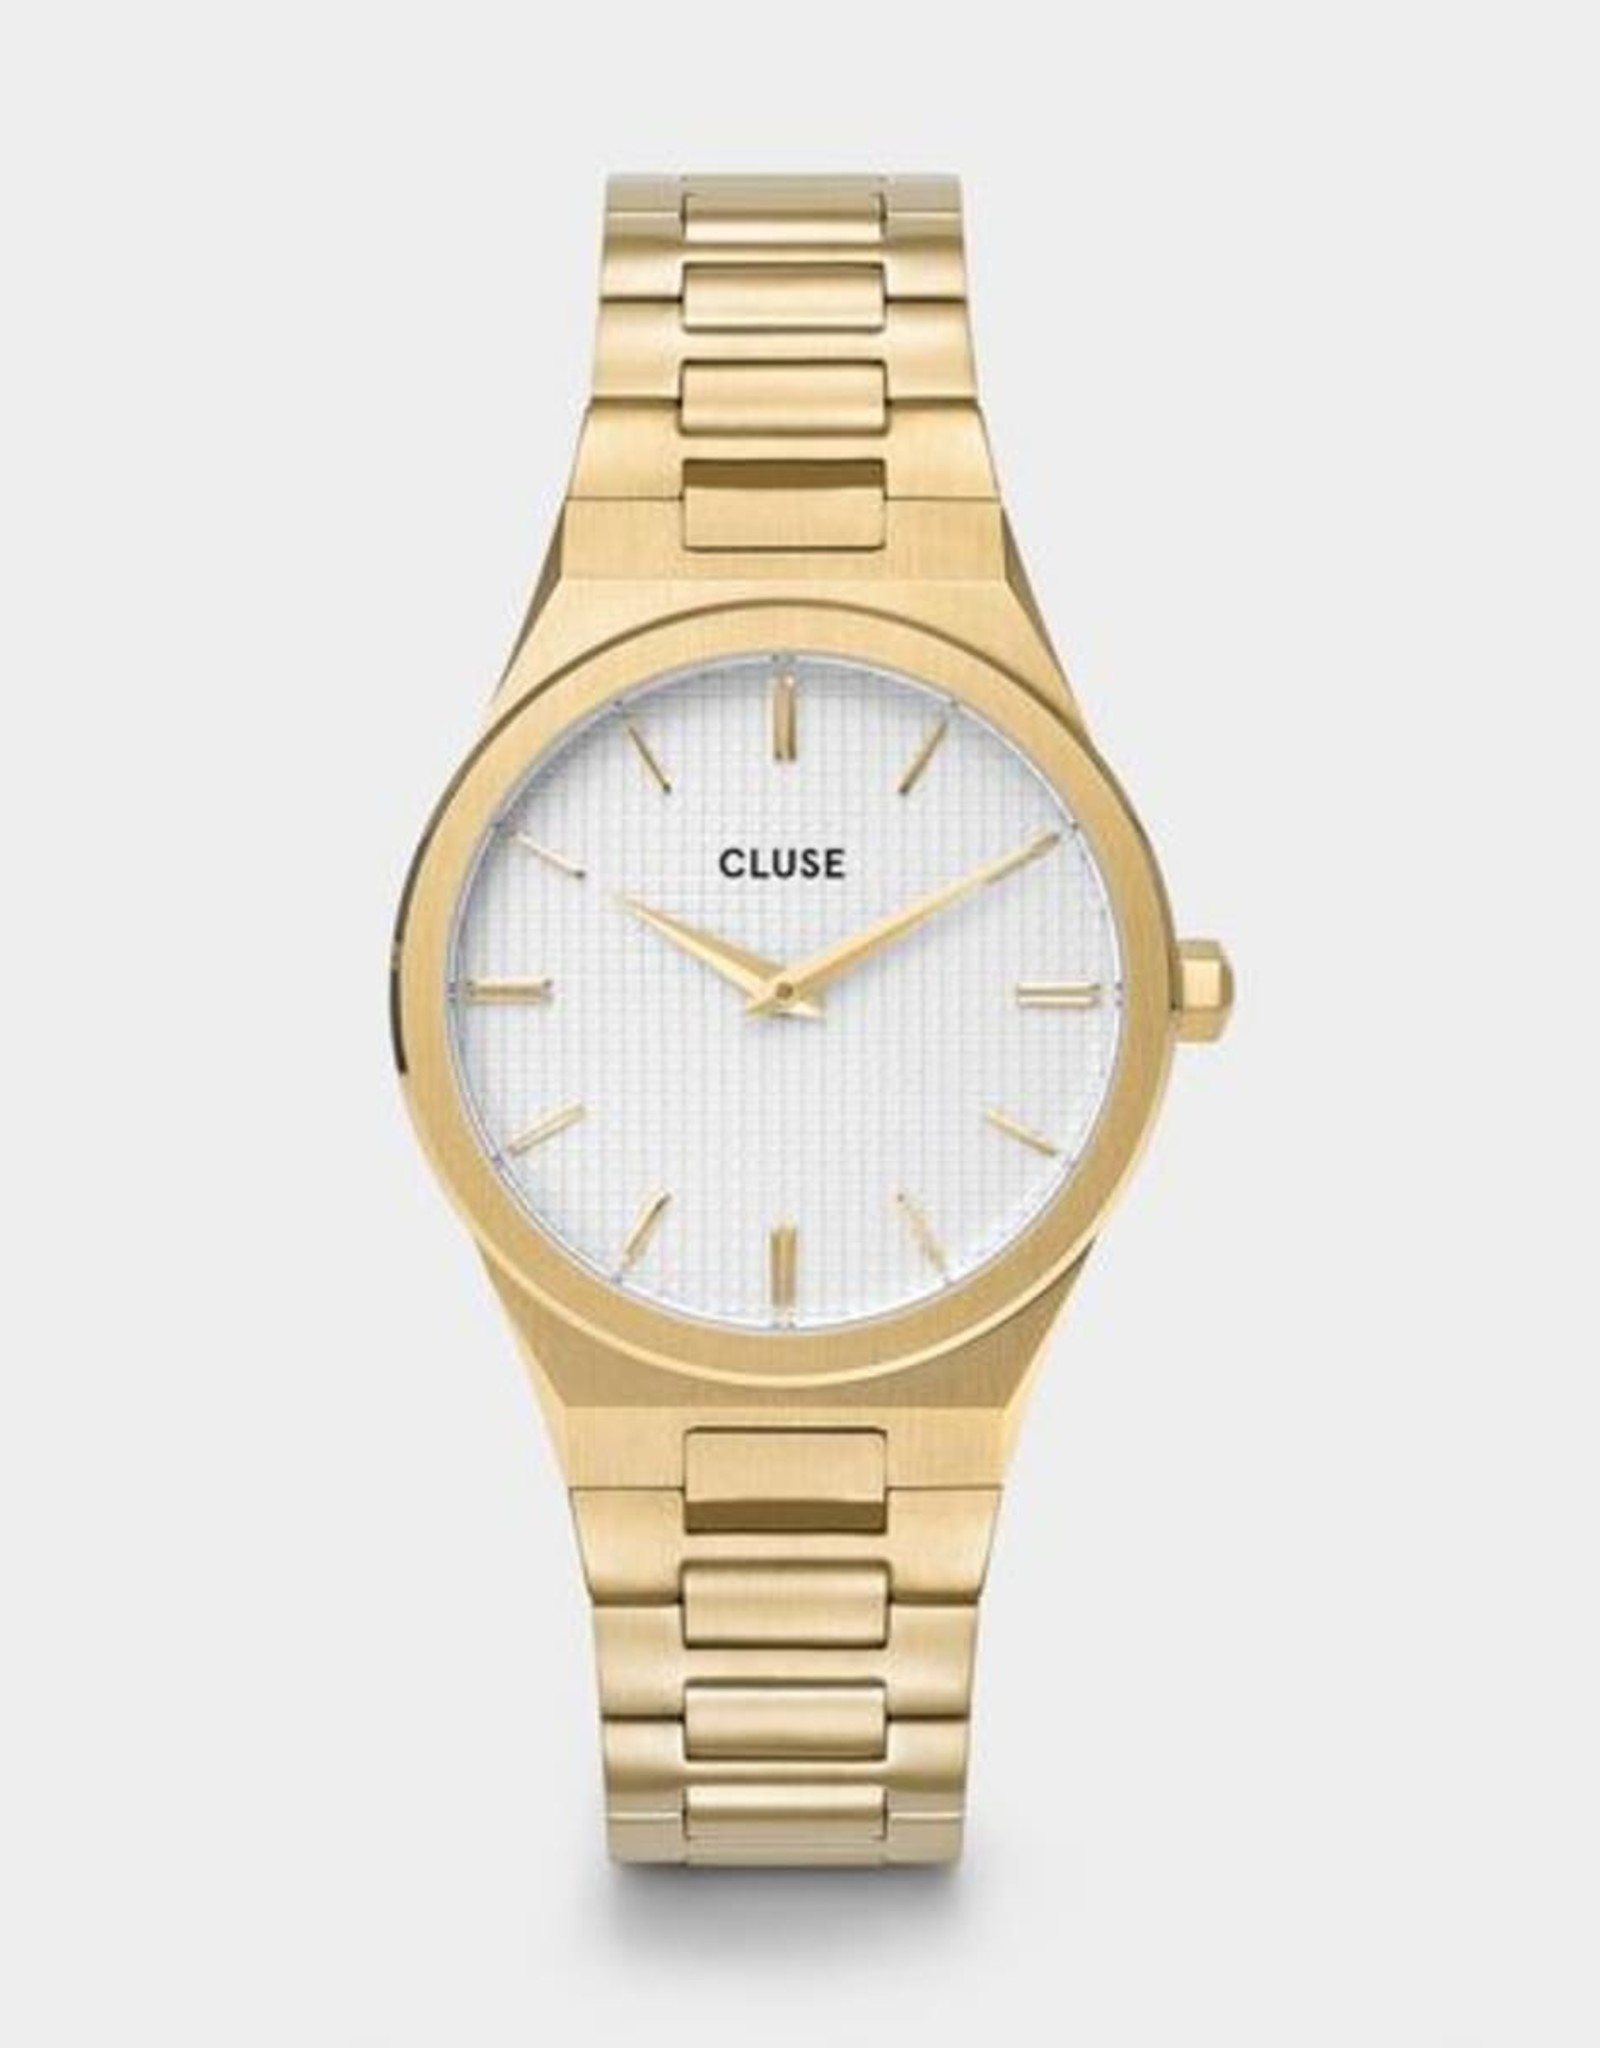 Cluse - Vigoureux 33 H-Link, Gold, Snow White/silver